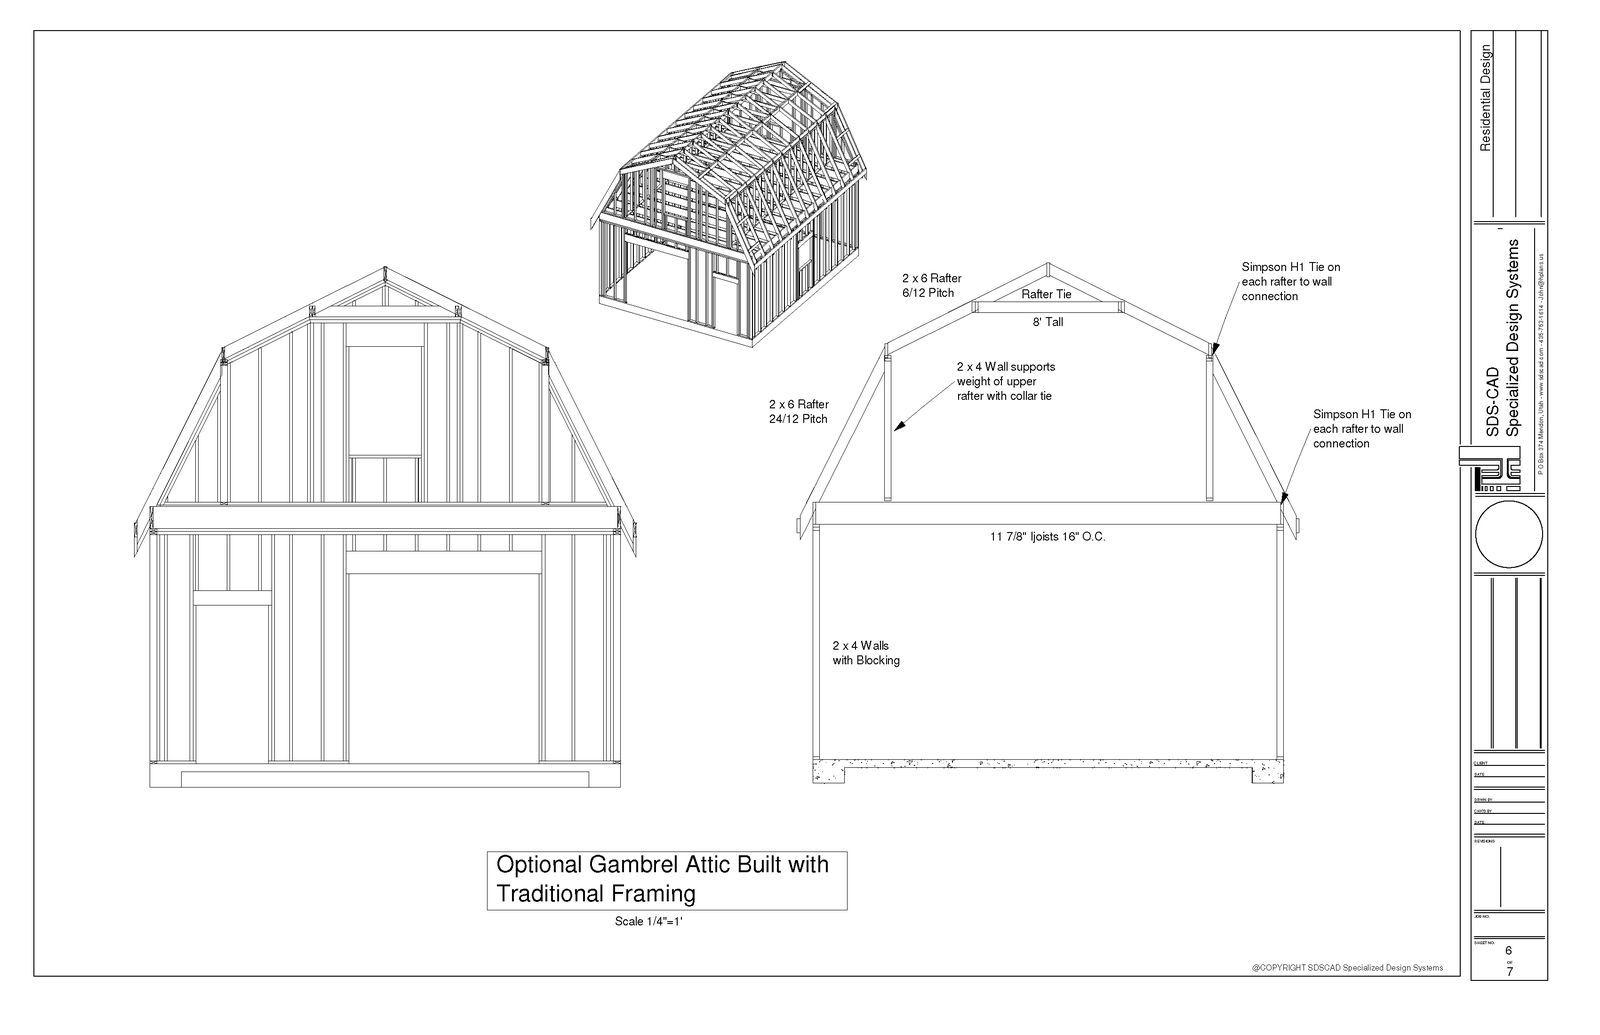 Gambrel Barn Plans Gambrel Barn Barn Plans Gambrel